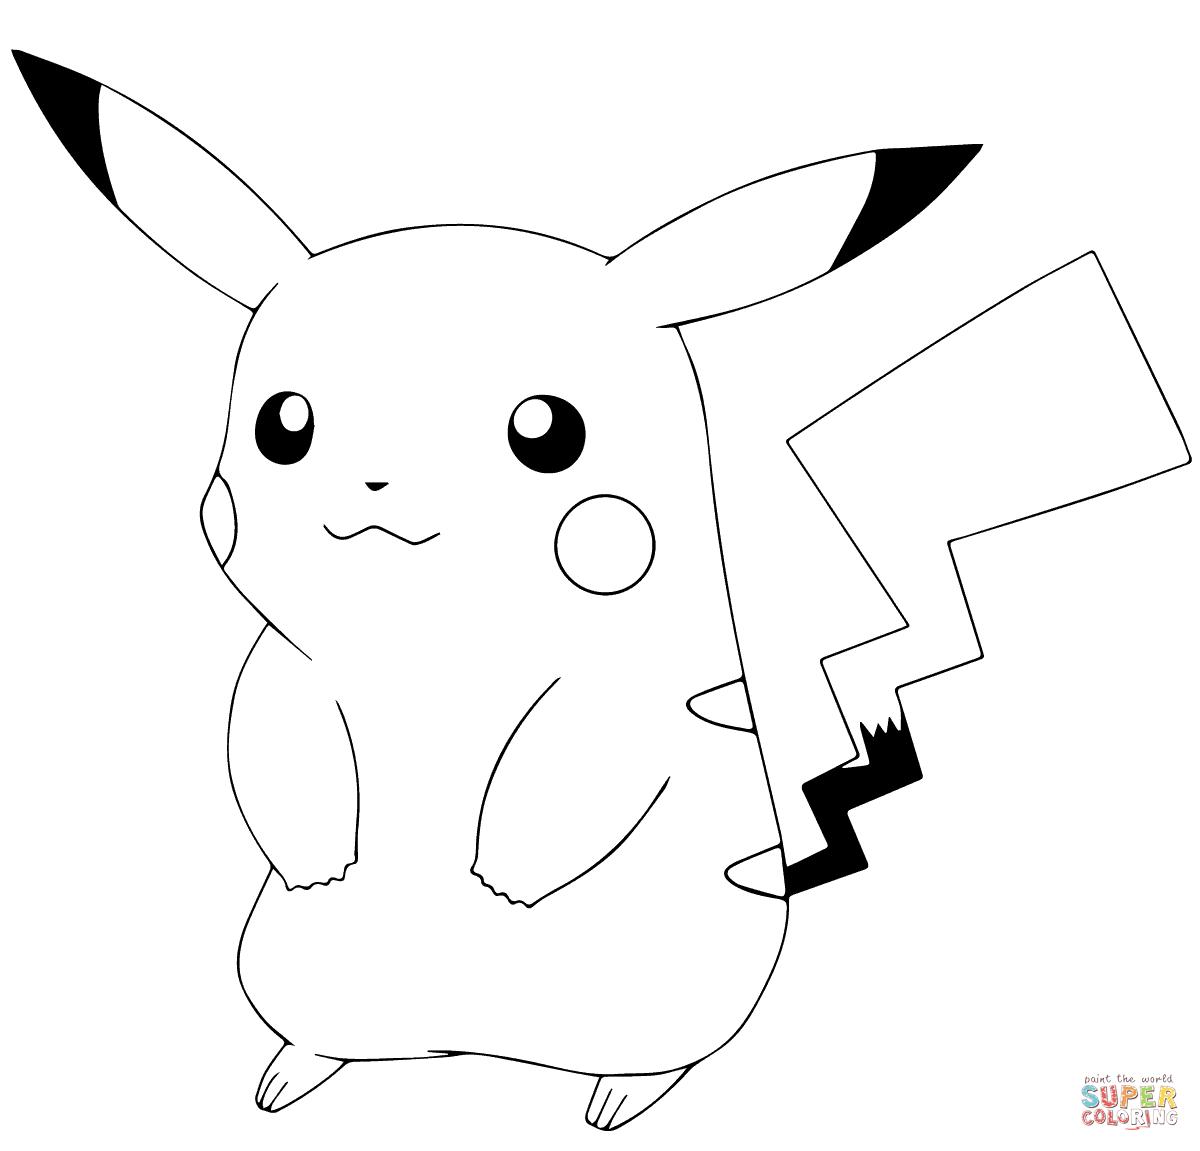 Pokémon Go Pikachu Coloring Page | Free Printable Coloring Pages - Free Printable Coloring Pages Pokemon Black White